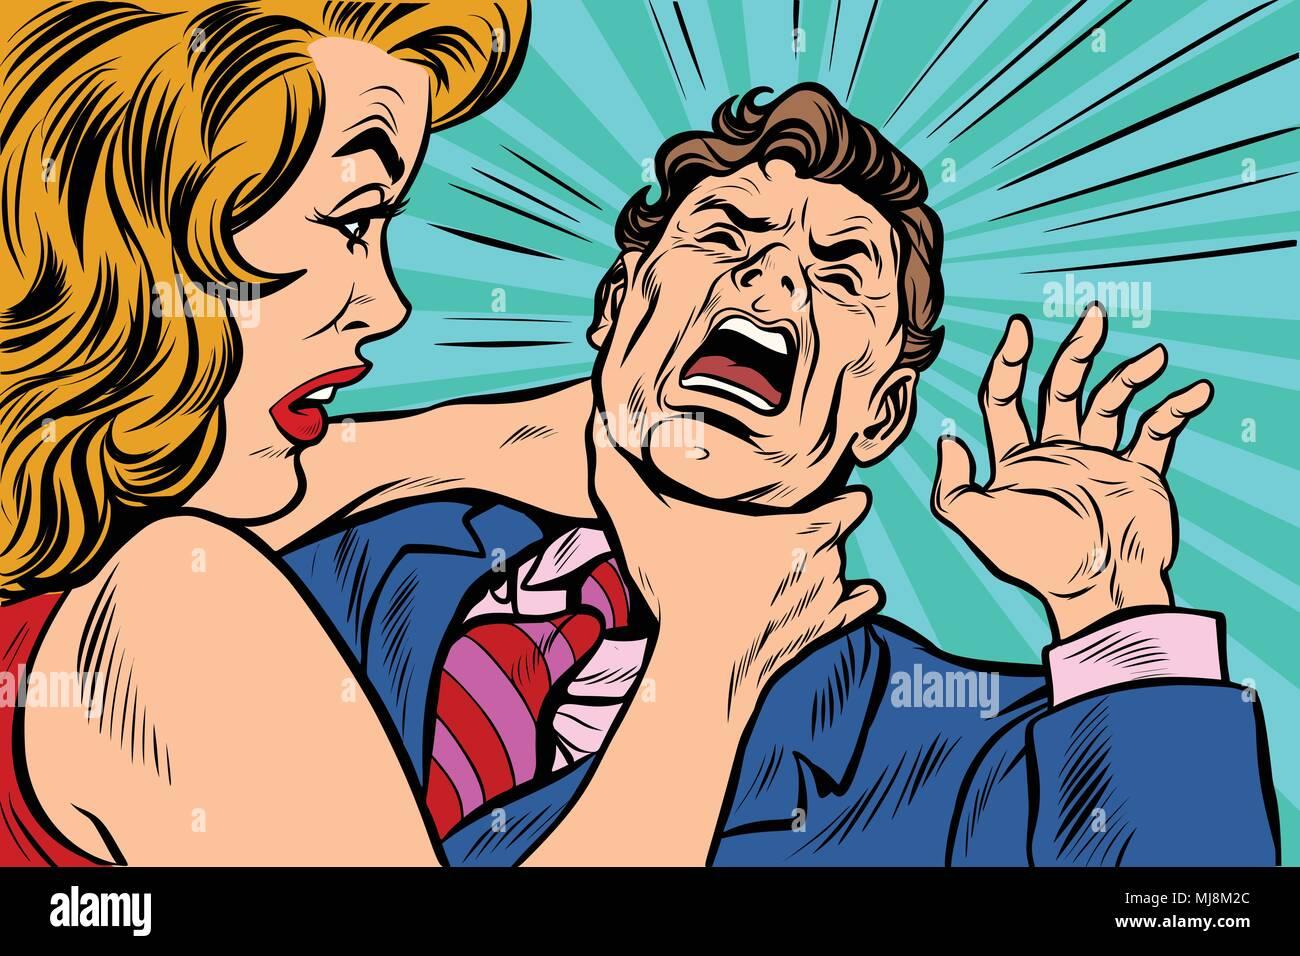 woman strangling man - Stock Image